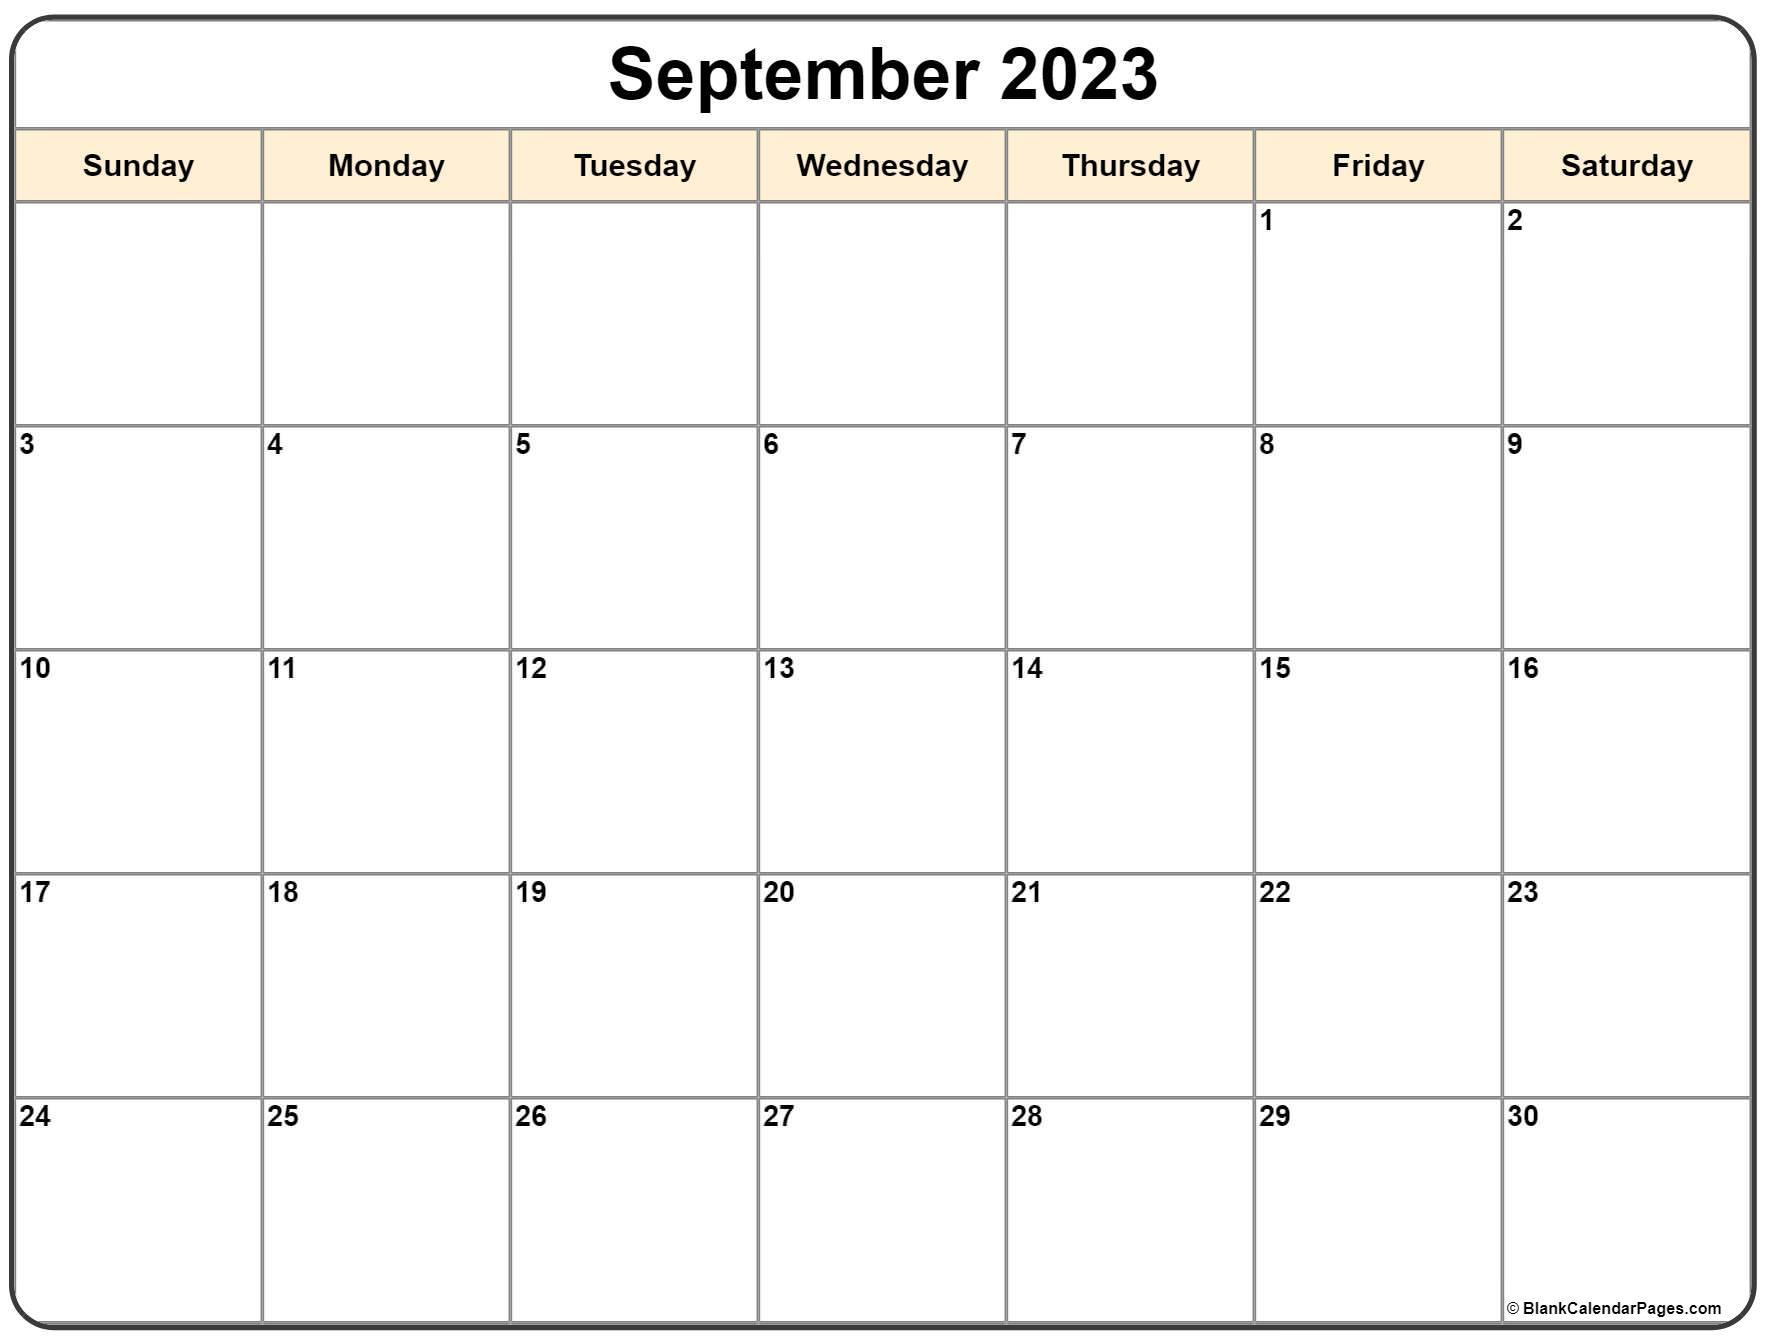 September 2022 calendar | free printable monthly calendars